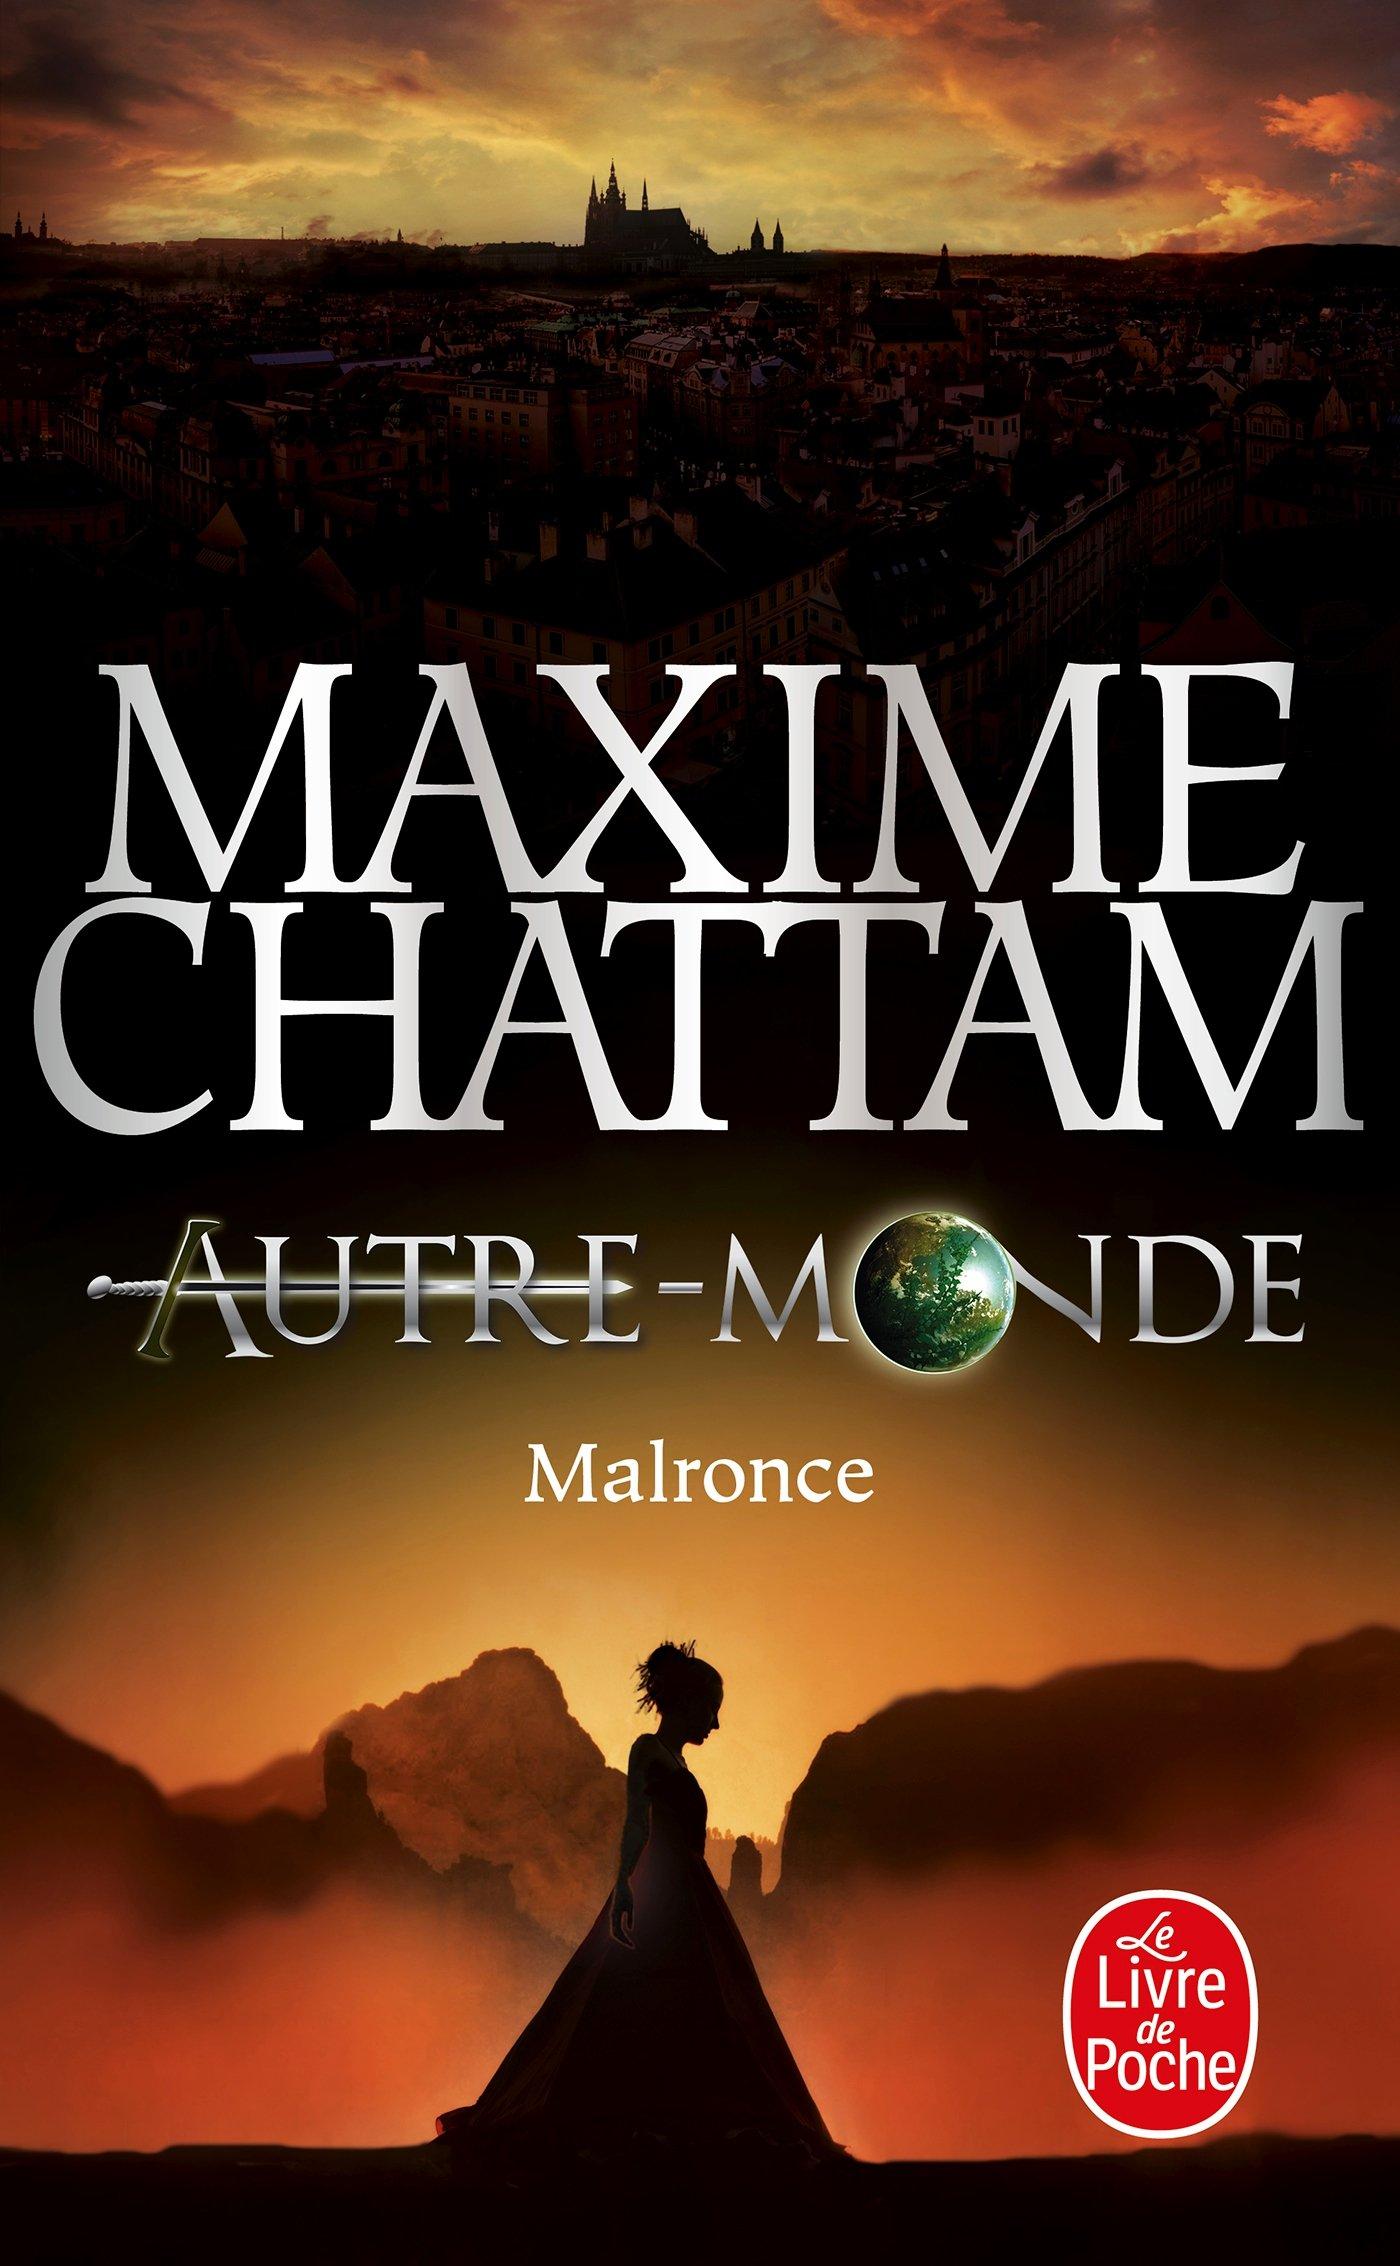 Malronce (Autre-Monde, Tome 2) Poche – 27 mars 2013 Maxime Chattam Le Livre de Poche 2253173584 Fantastique